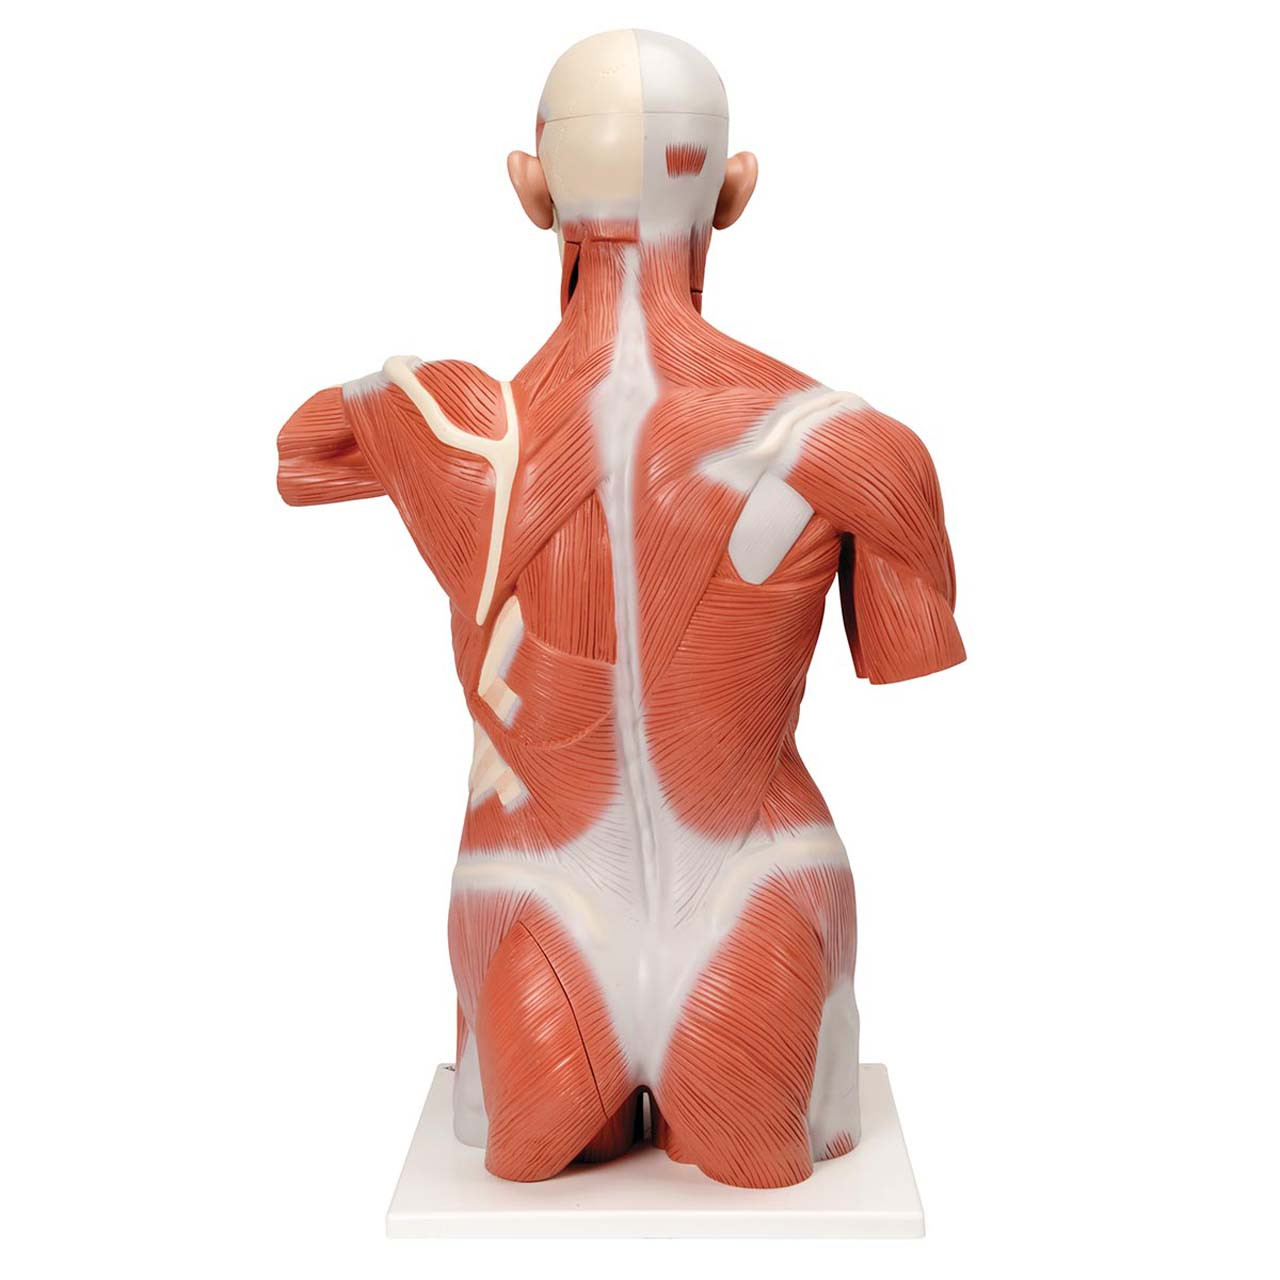 1001236 - Life size Muscle Torso Model, 27 part